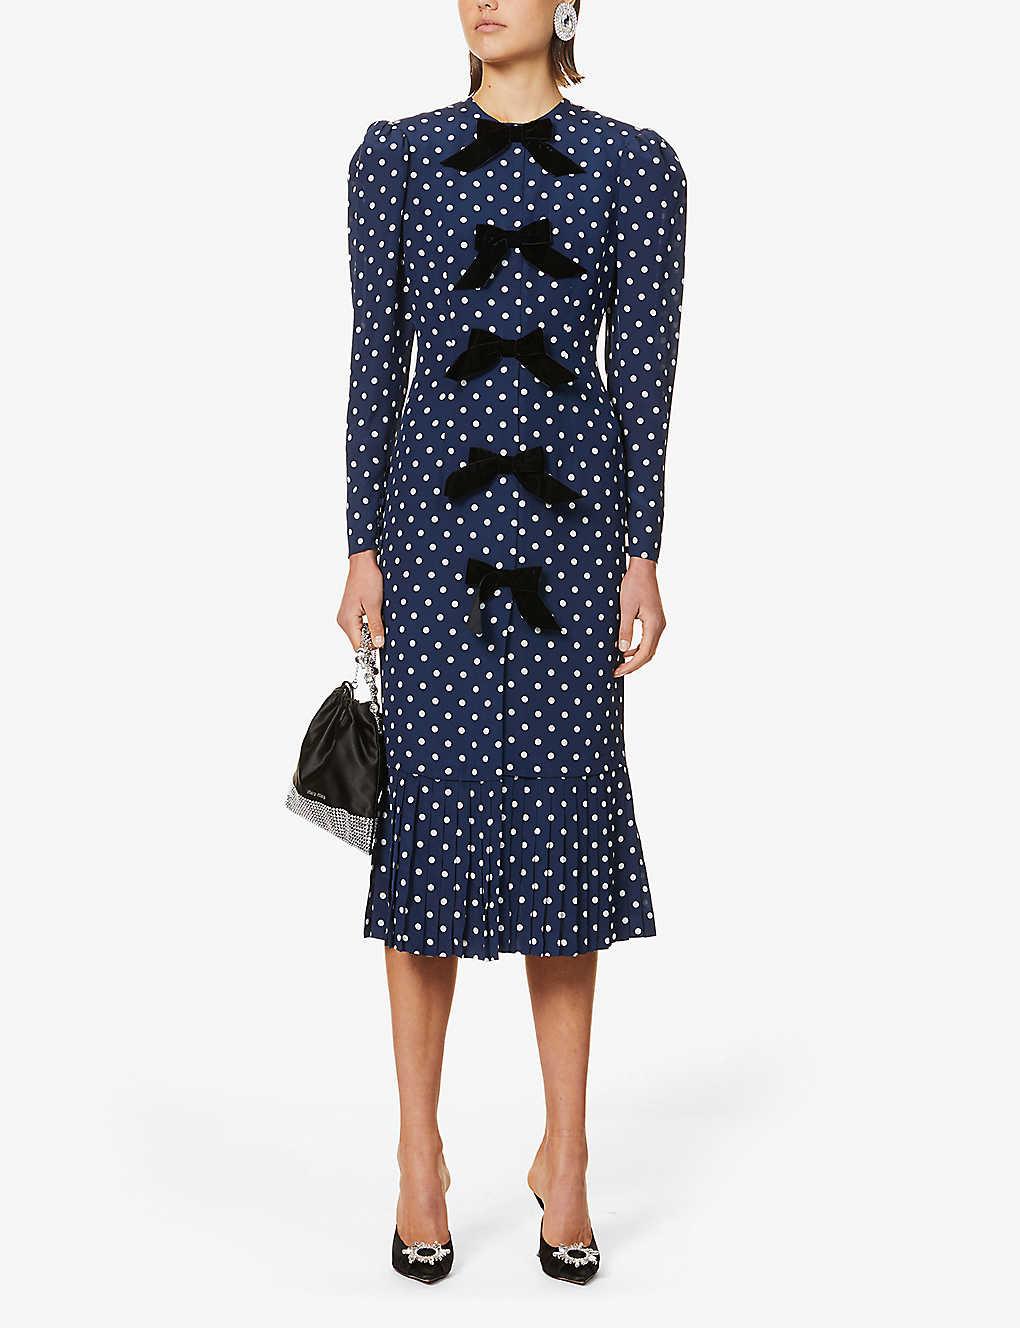 ALESSANDRA RICH Bow-embellished Polka-dot Silk Midi Dress